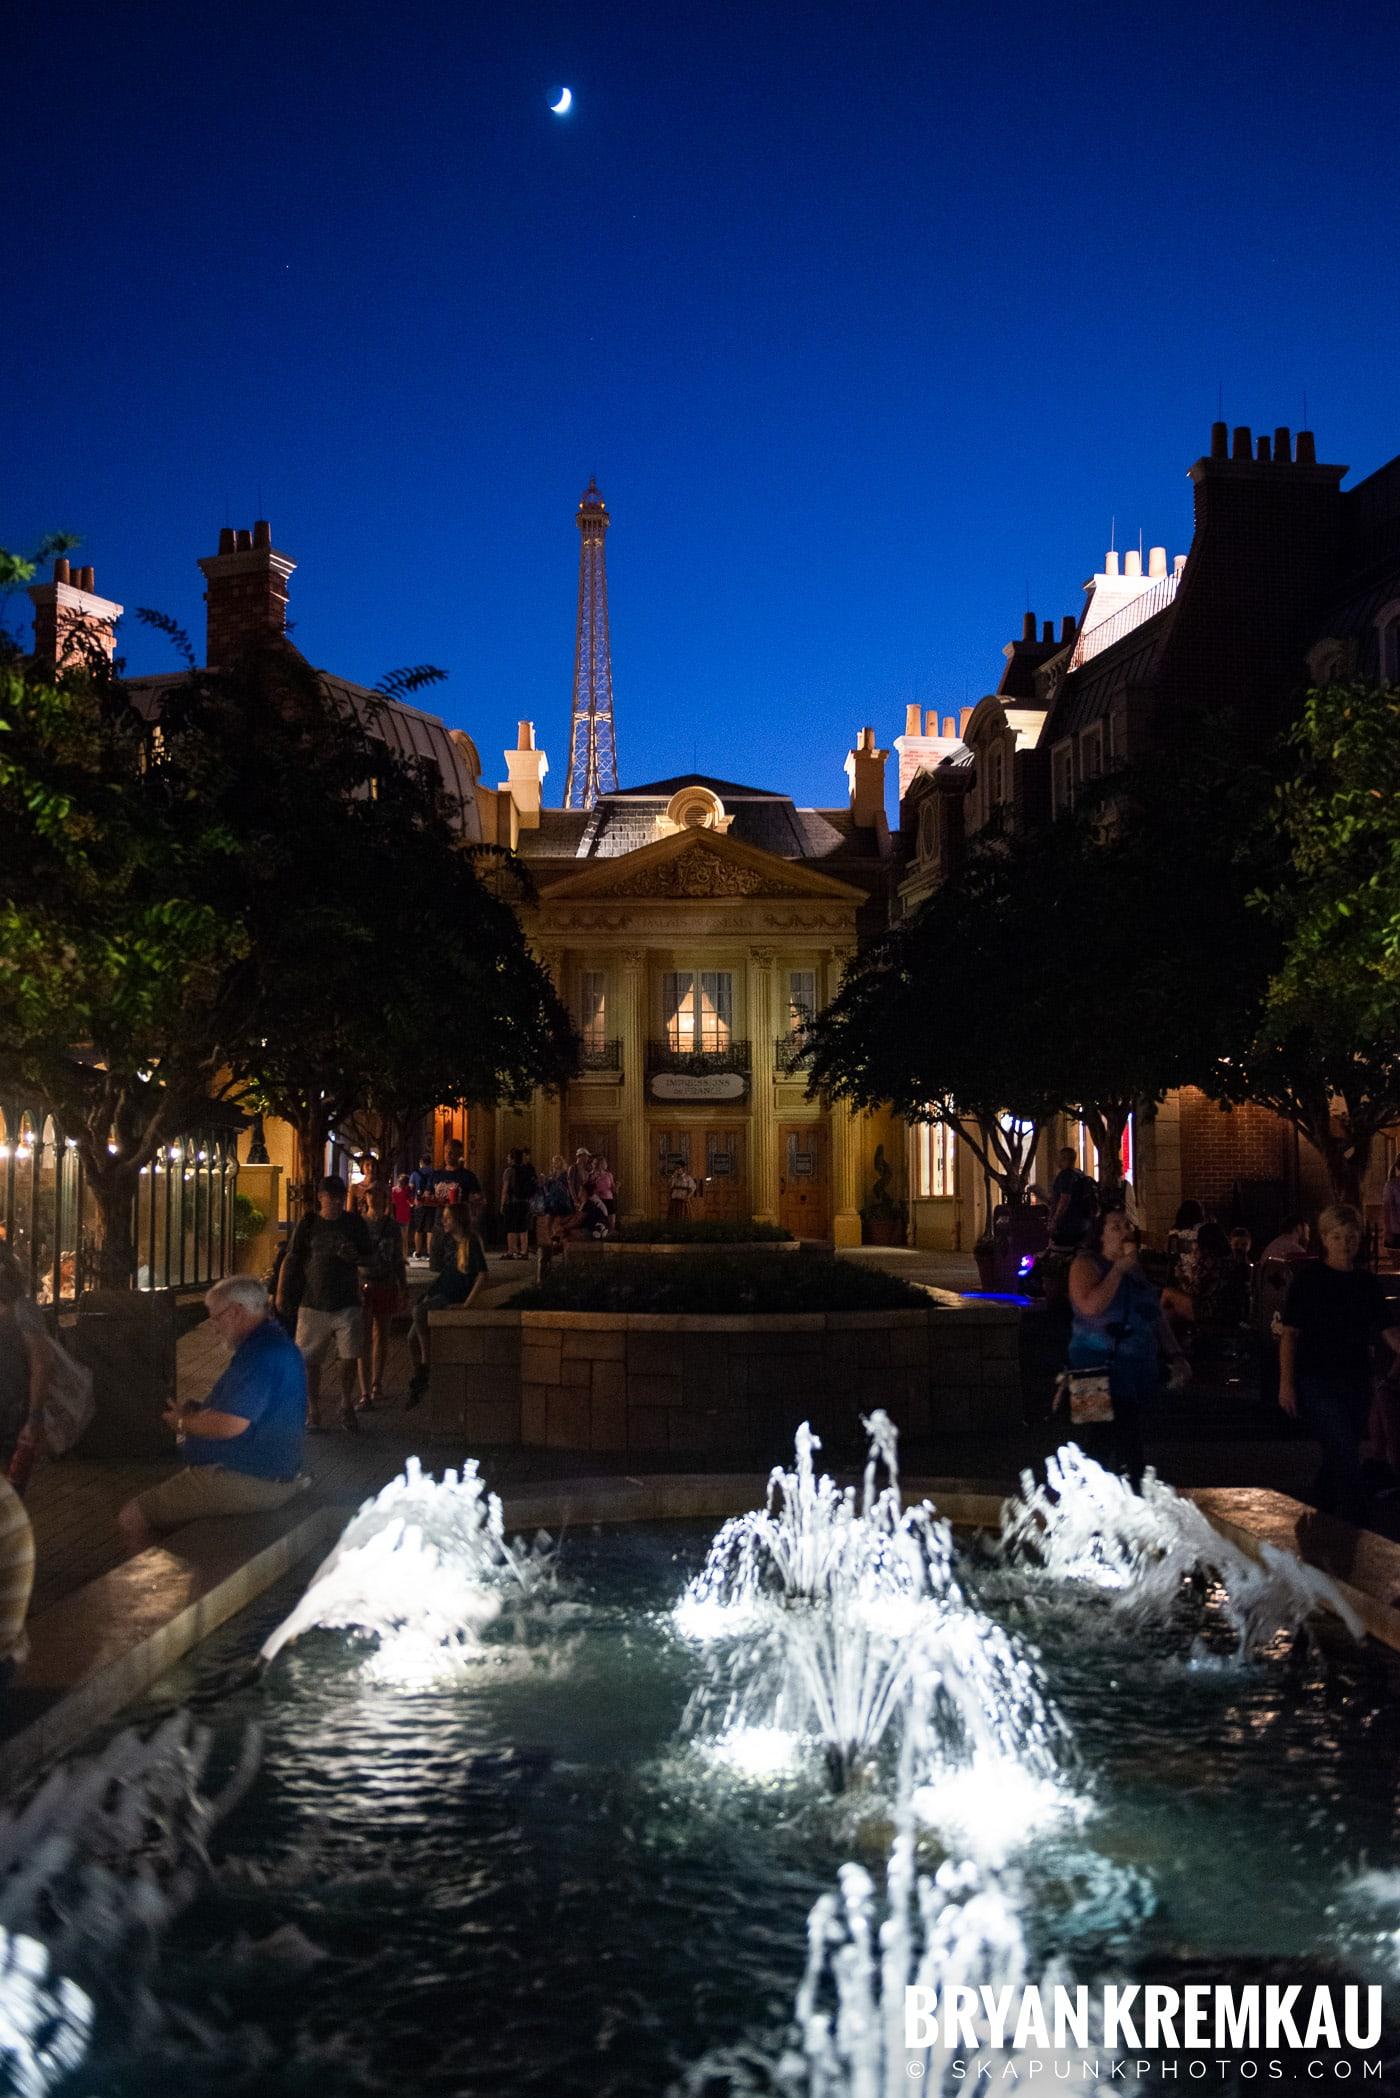 Walt Disney World Vacation: Day 4 (Epcot) October 2nd 2019 (19)